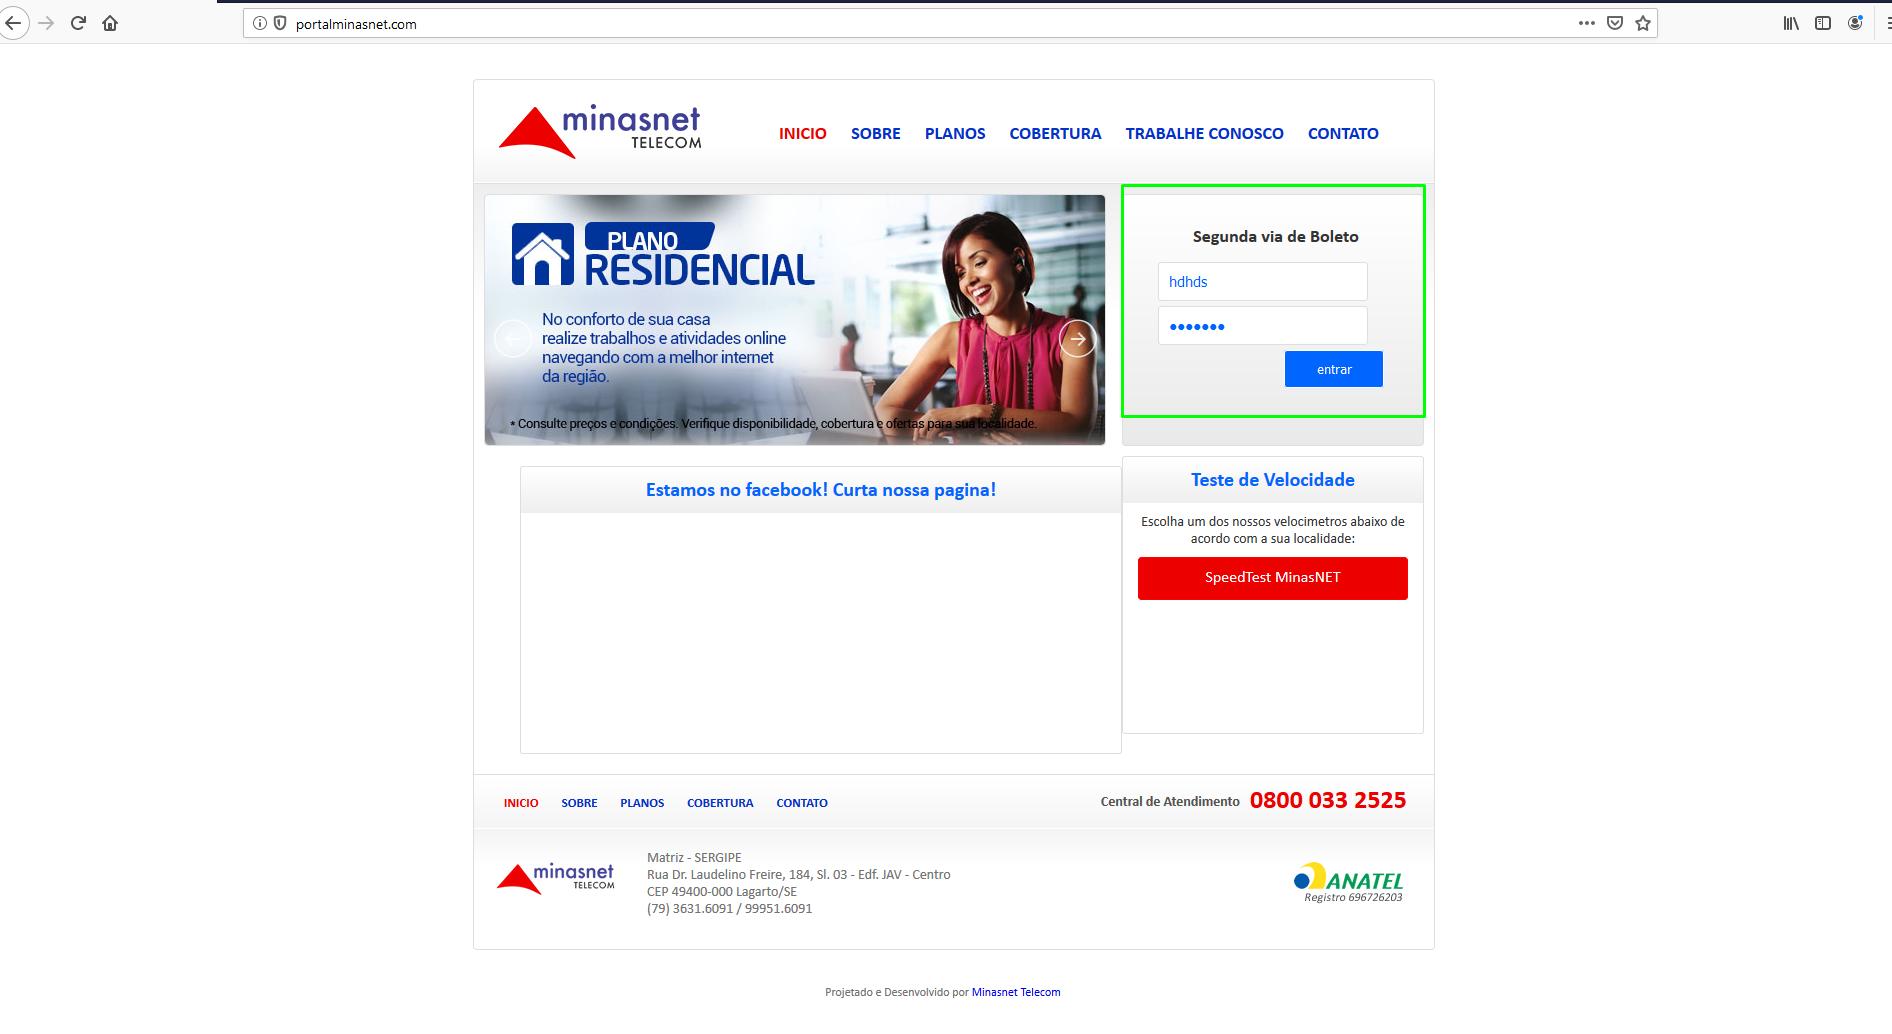 Issue #18143 | webcompat com